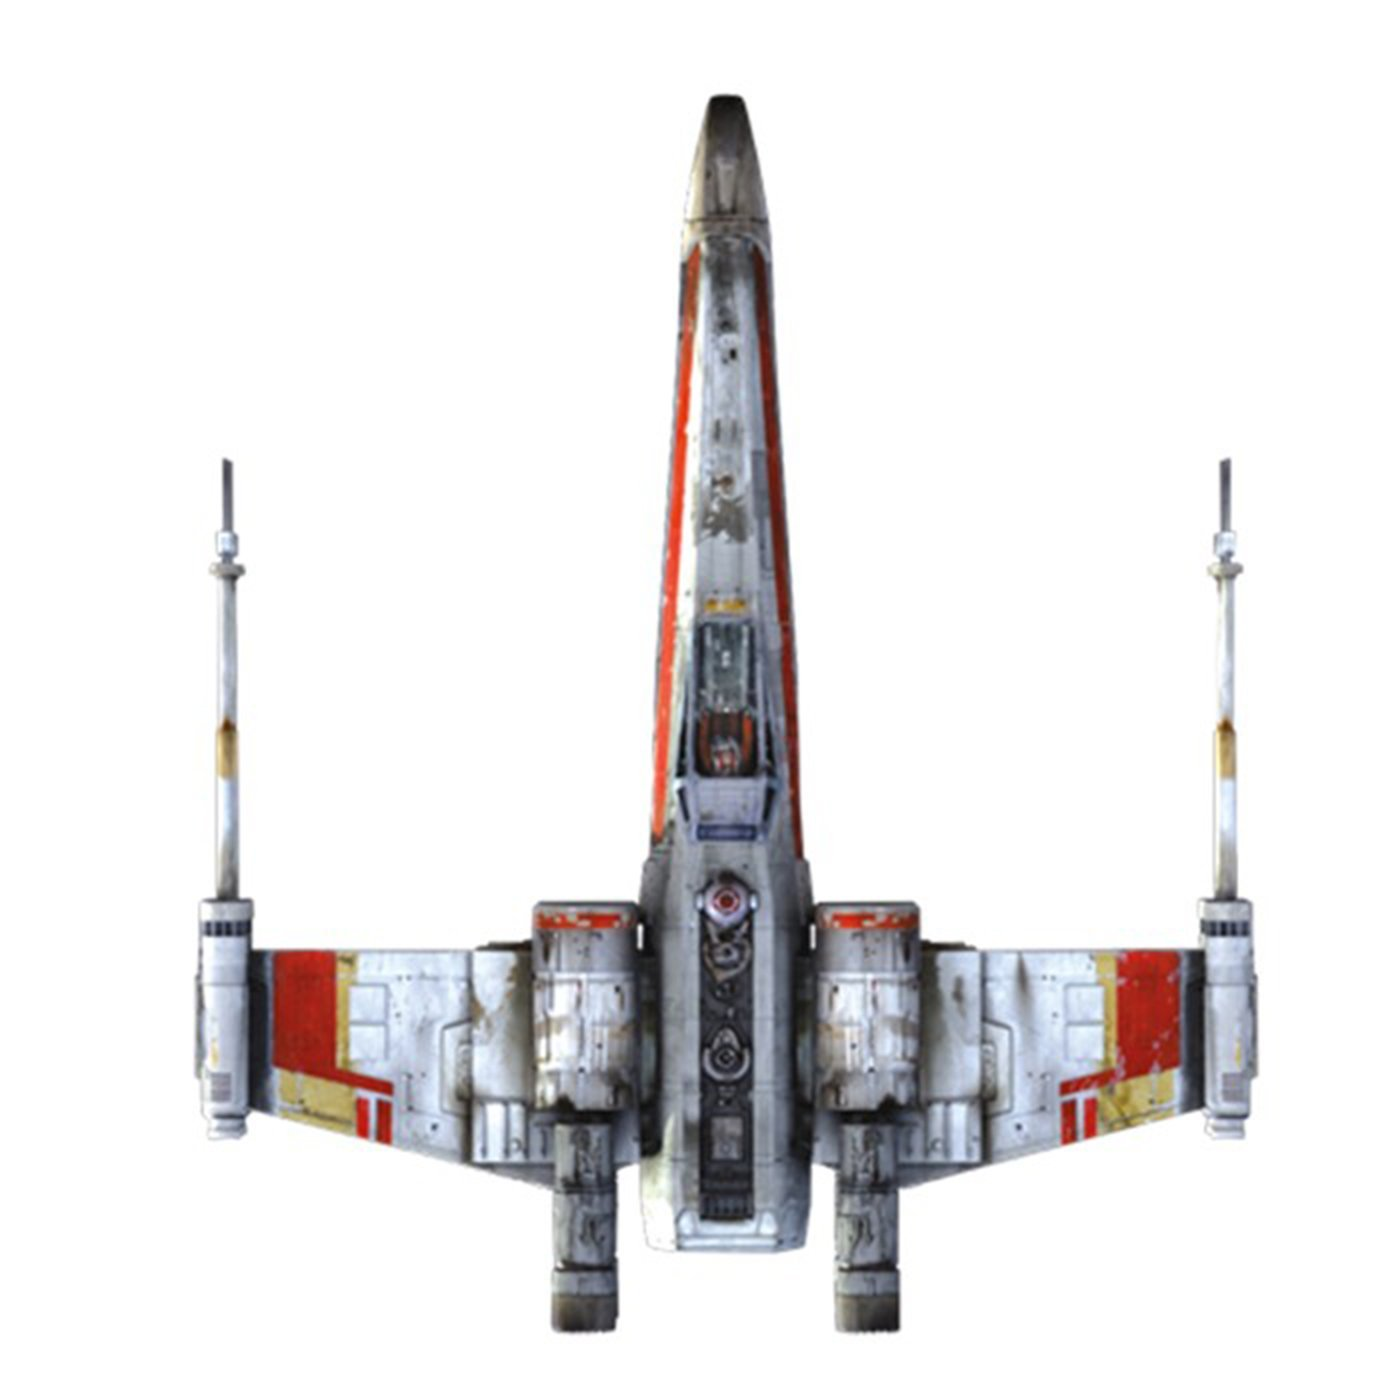 X-Kites Star Wars Deluxe Nylon Fighter Kite X-Wing